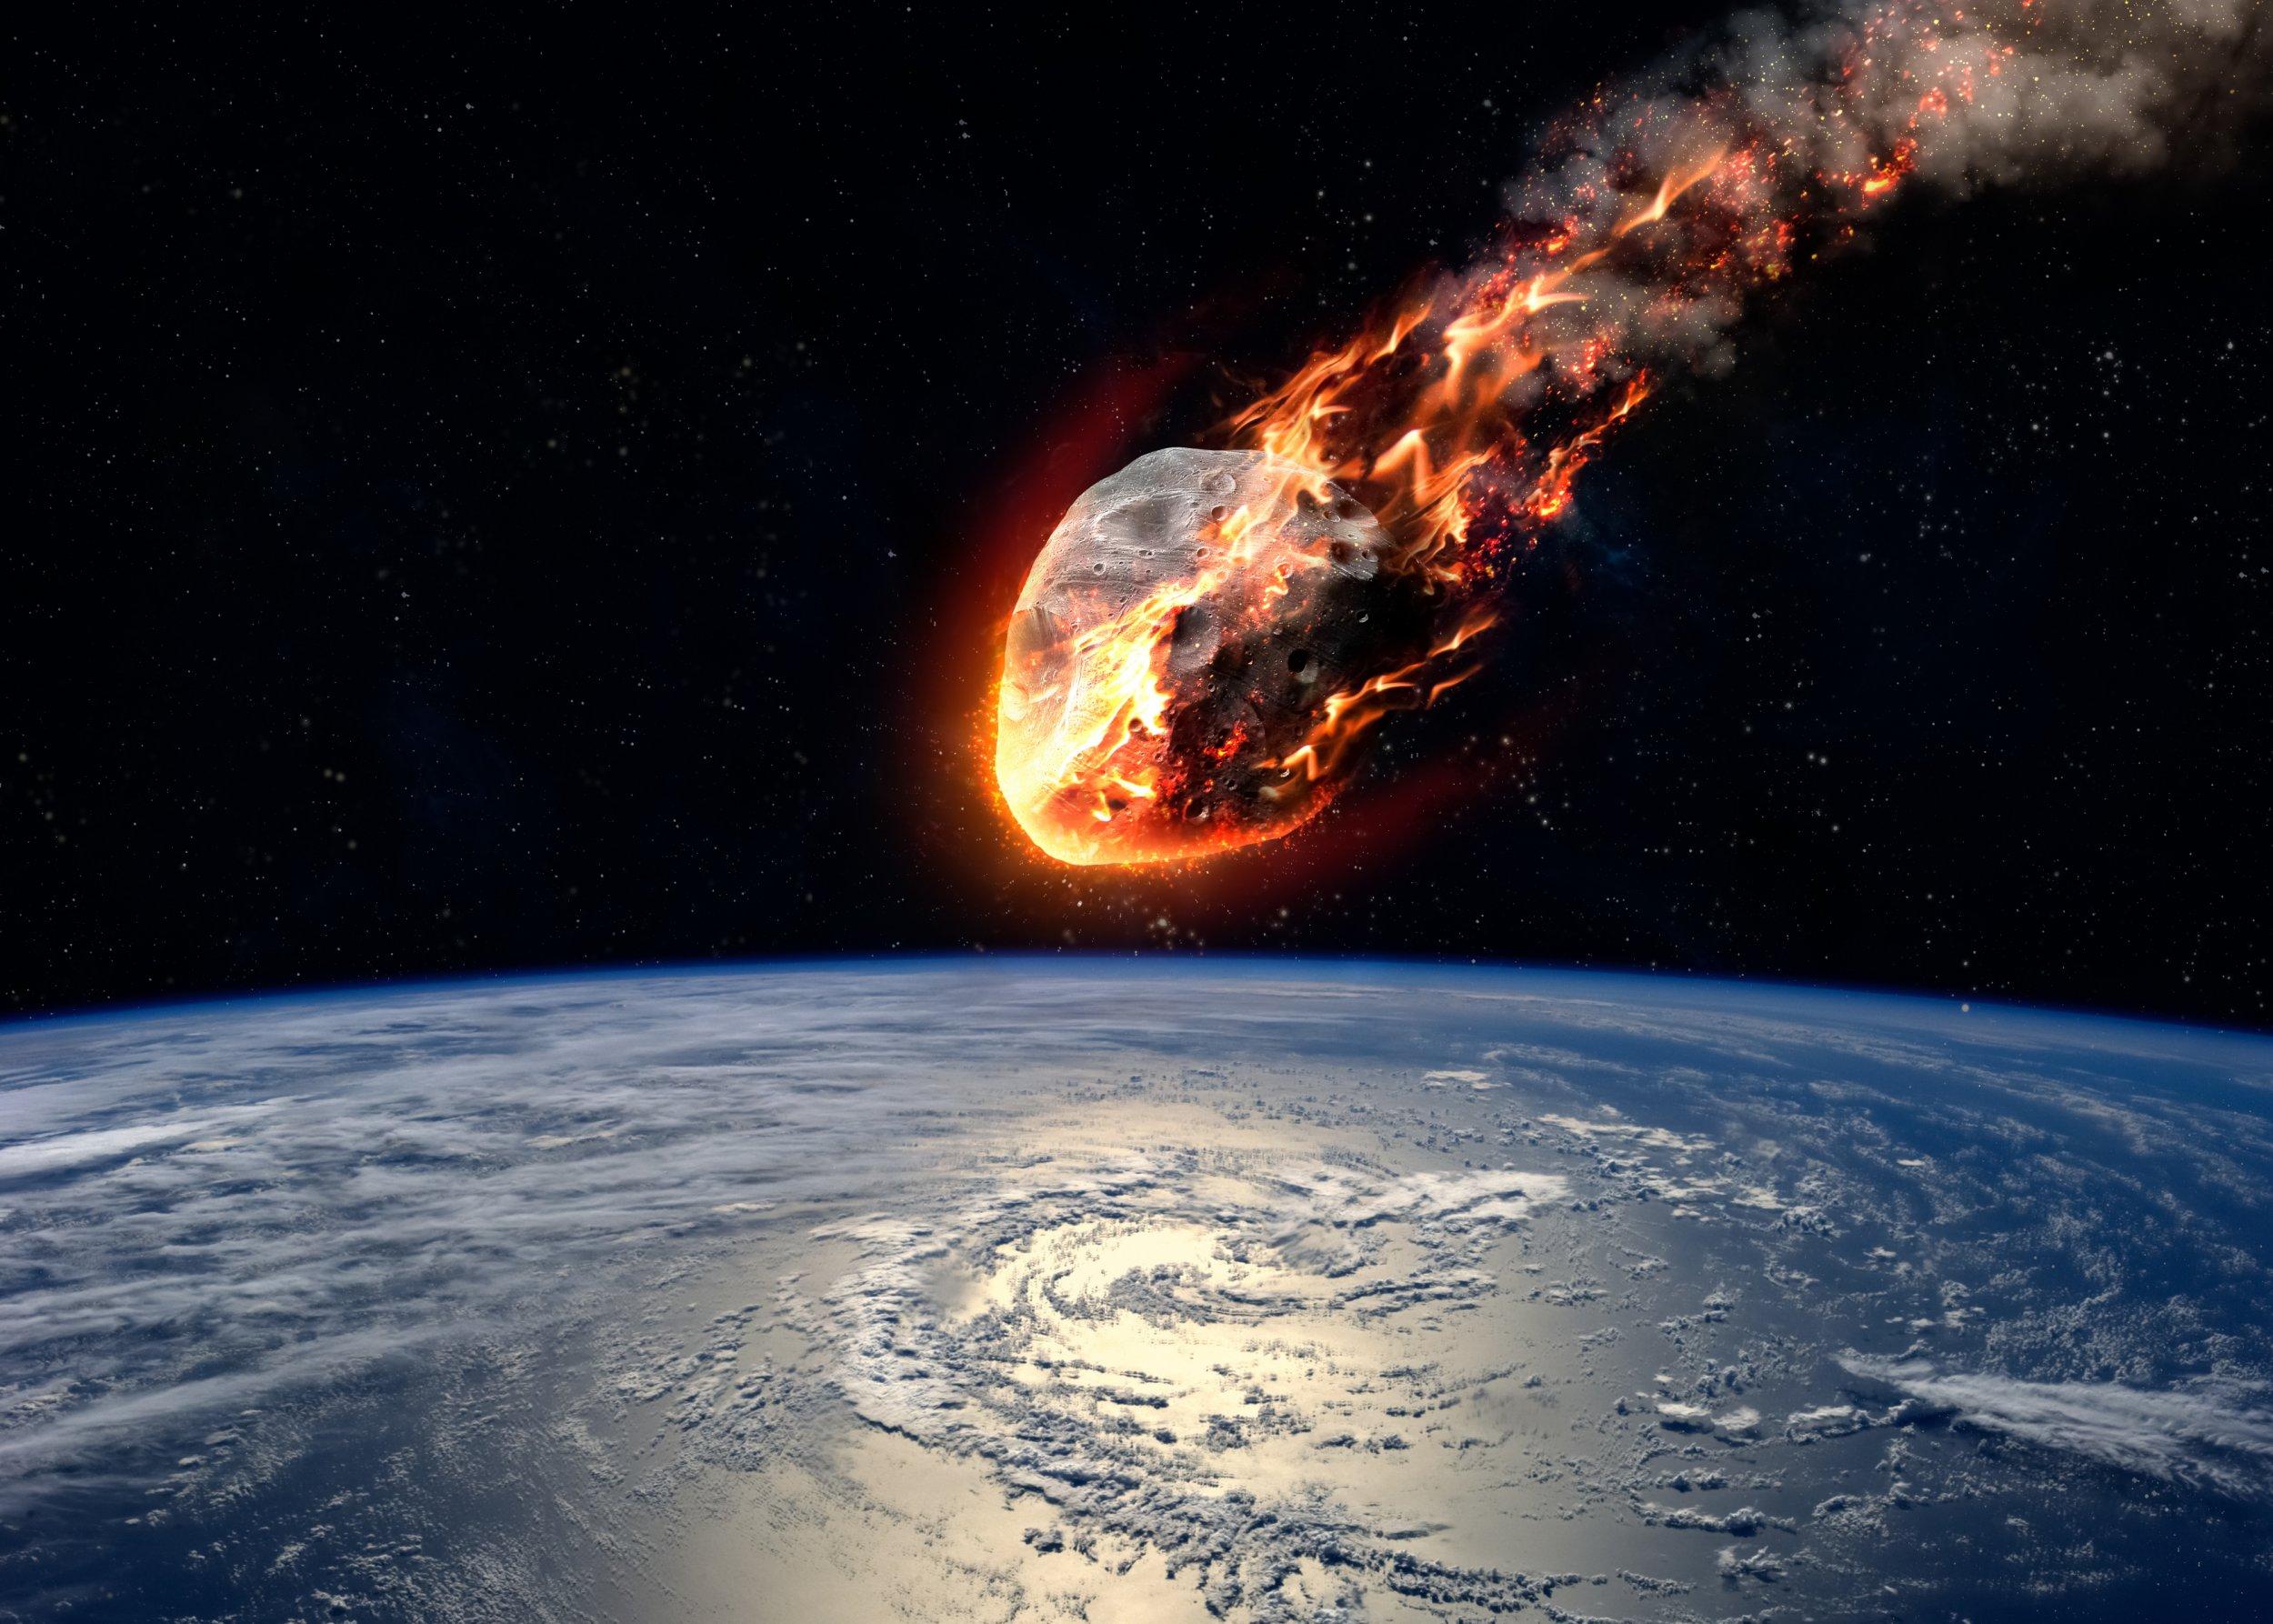 Gigantic 'Friday the 13th Asteroid' is headed towards Earth, Nasa warns